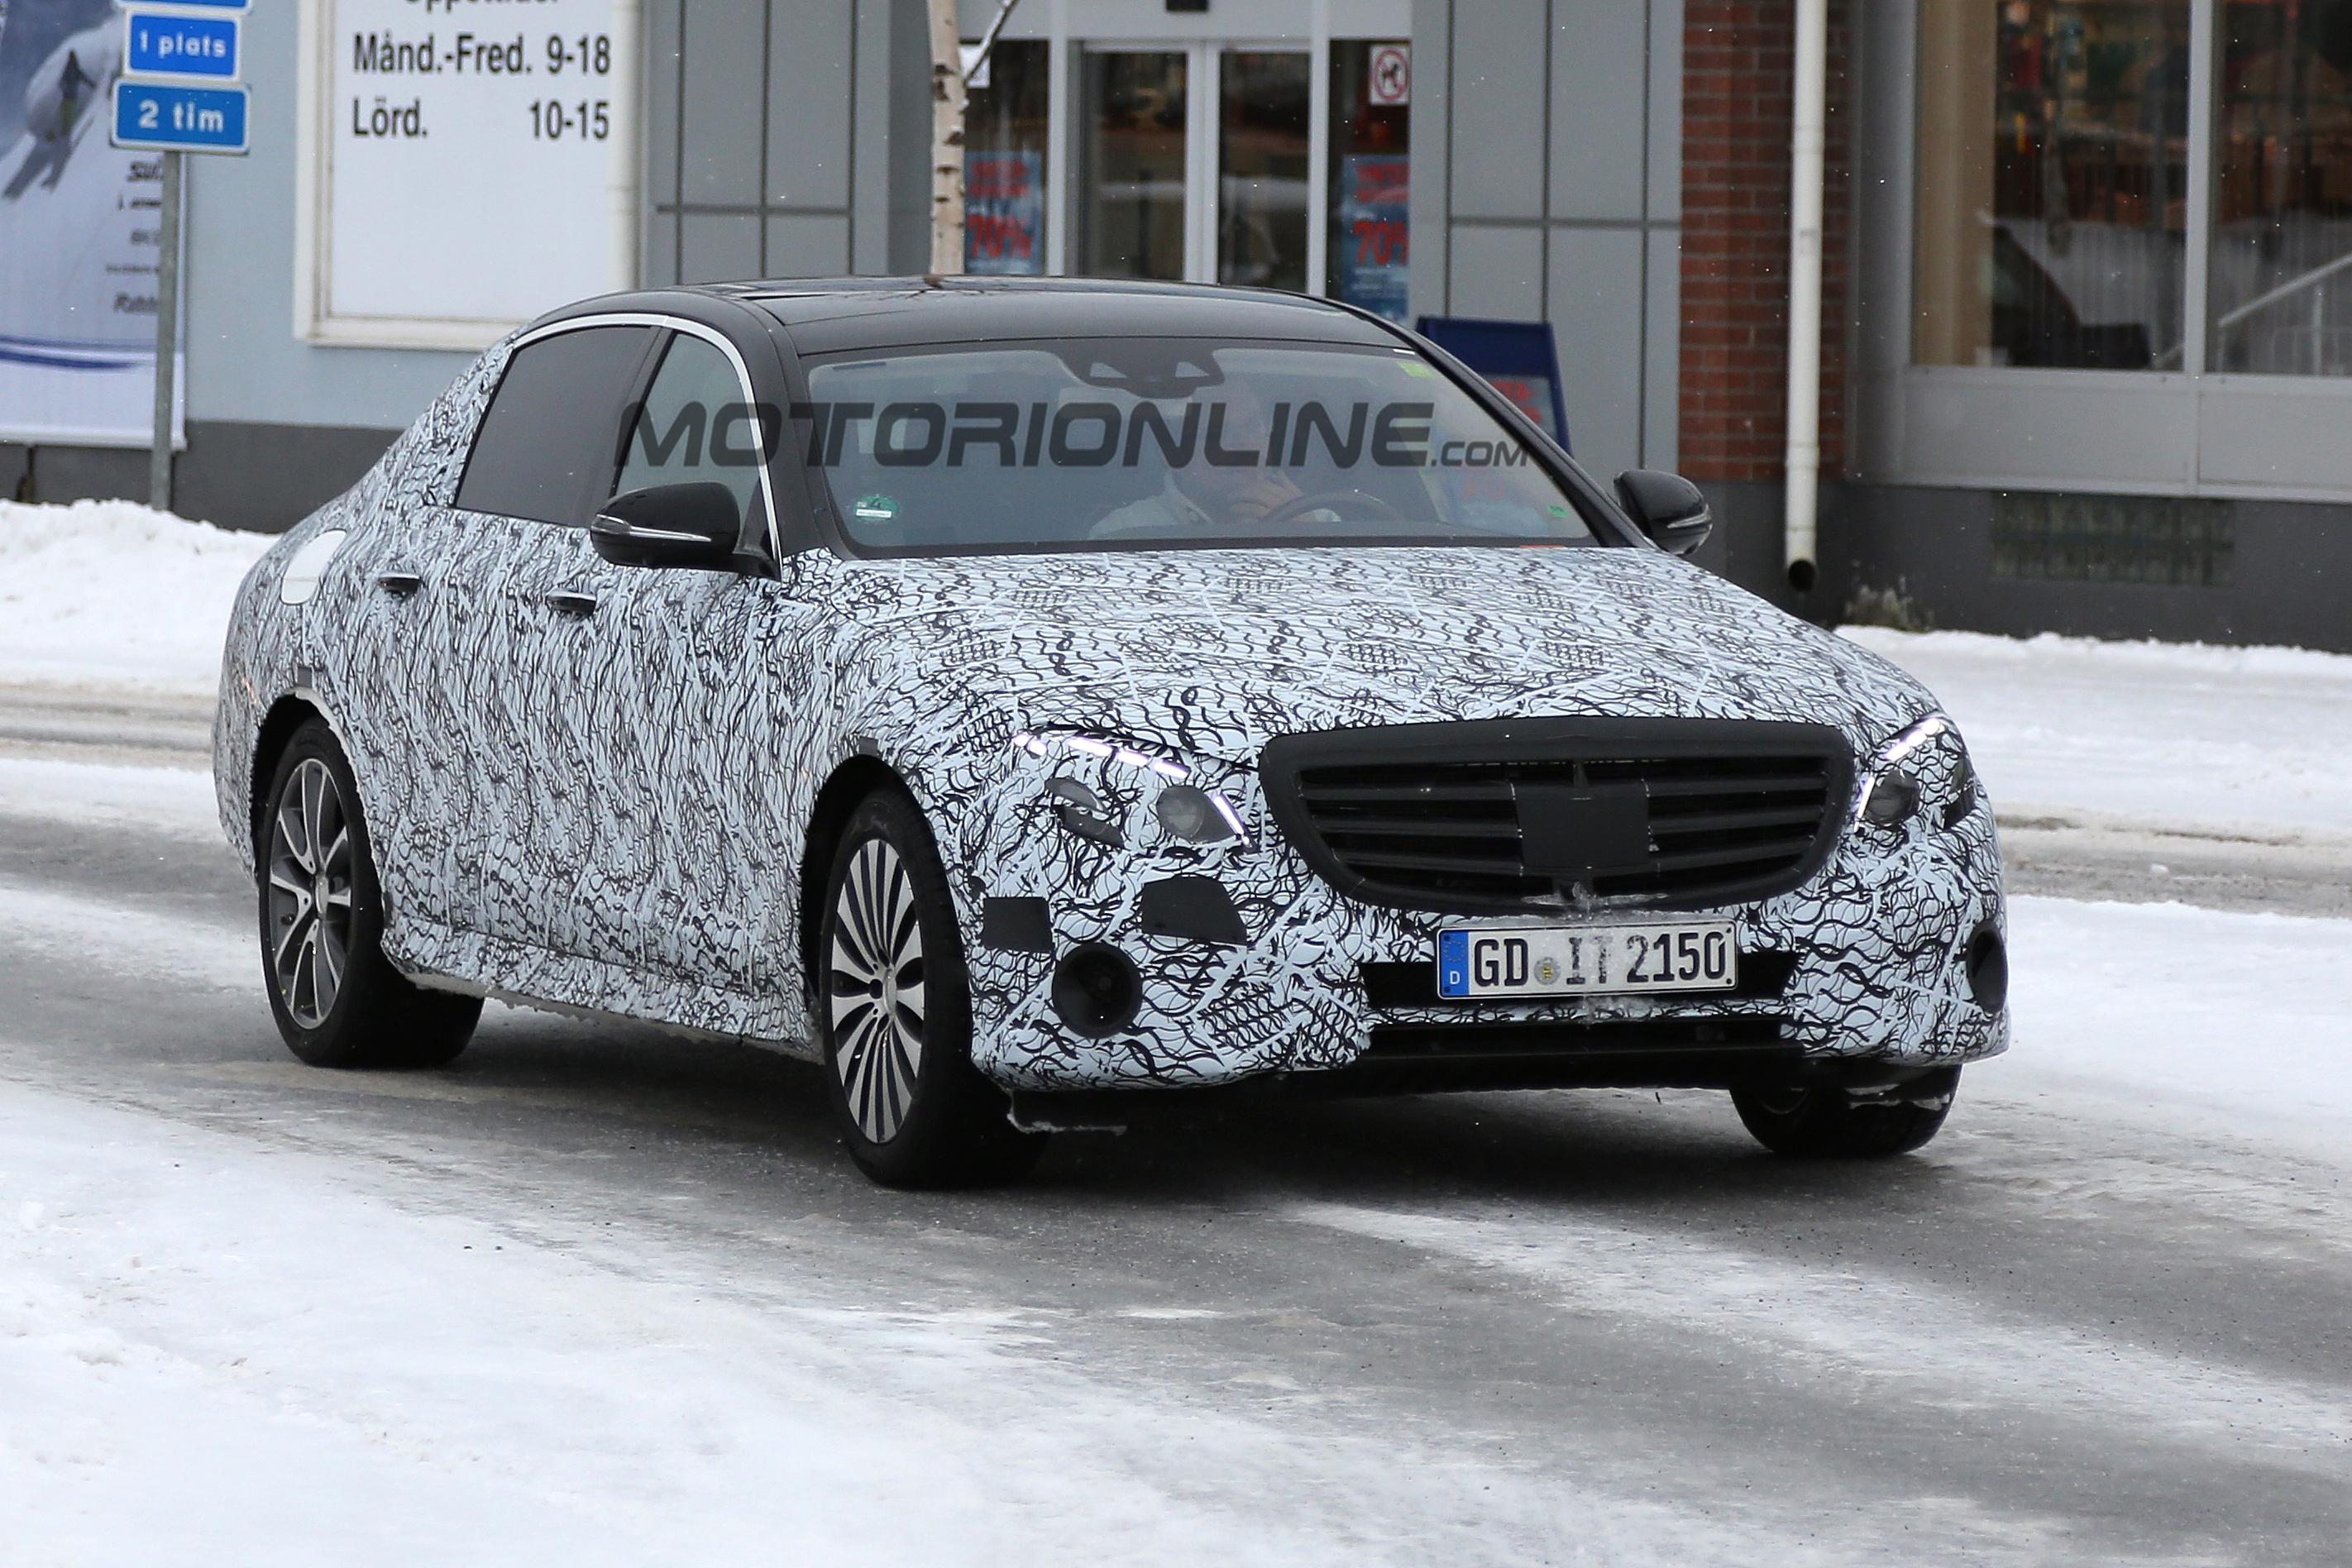 Mercedes Classe E Maybach - Foto spia 11-04-2016